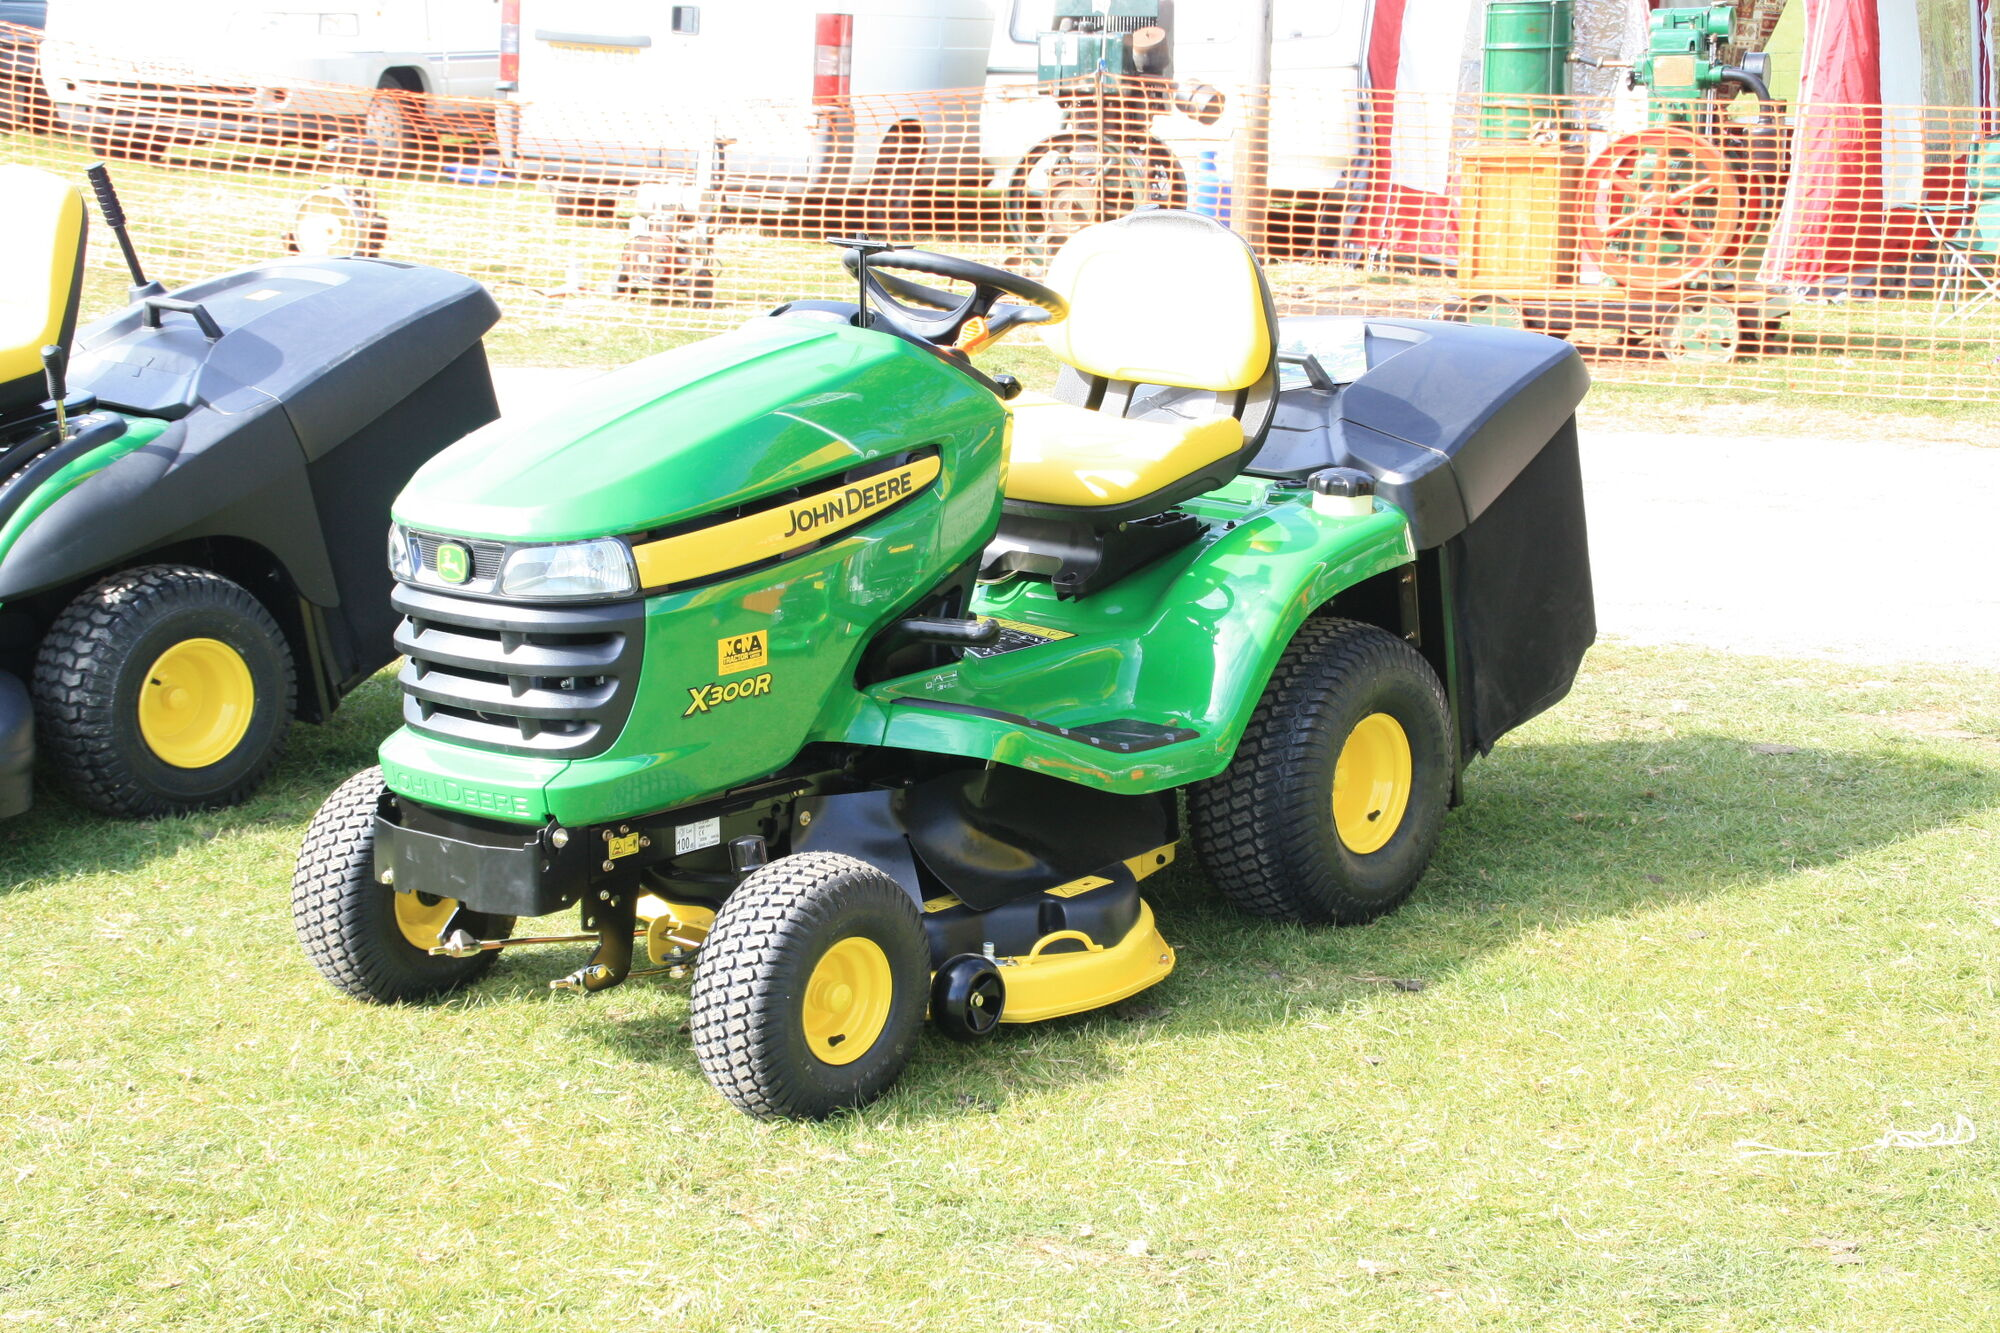 john deere x300r tractor construction plant wiki. Black Bedroom Furniture Sets. Home Design Ideas